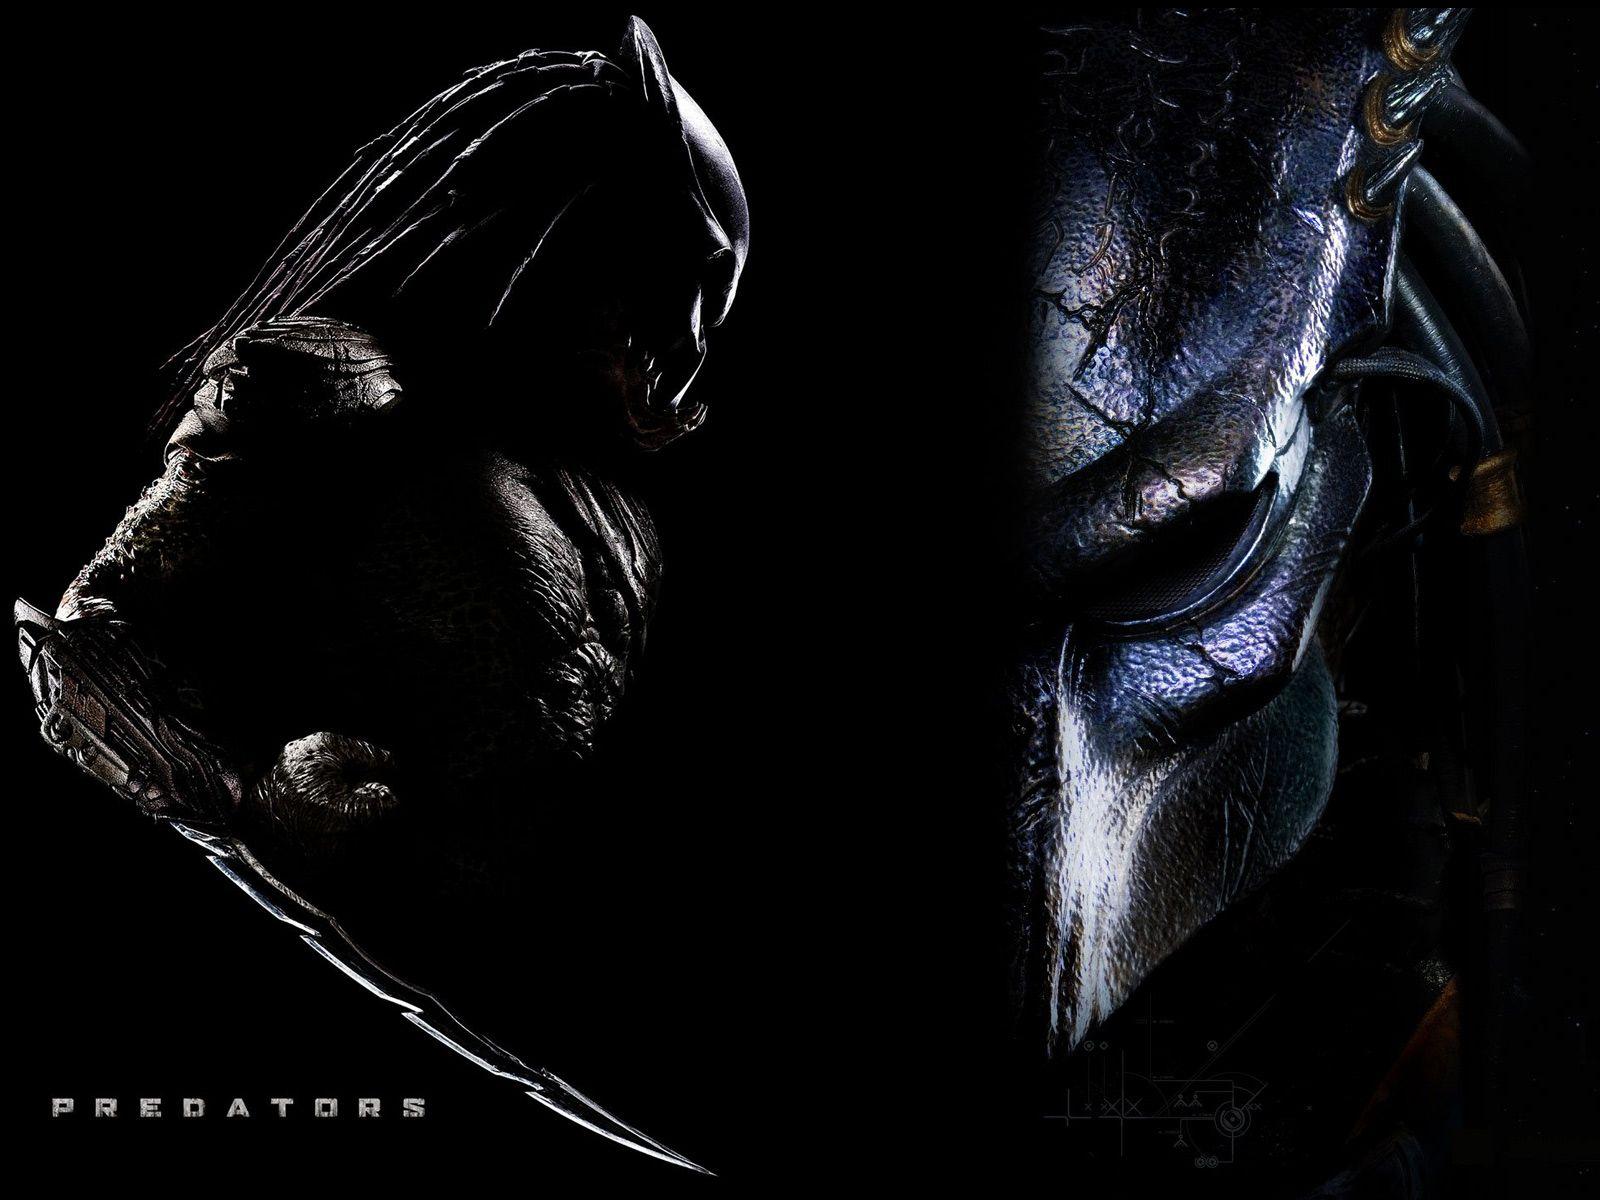 predator species hd image background wallpaper